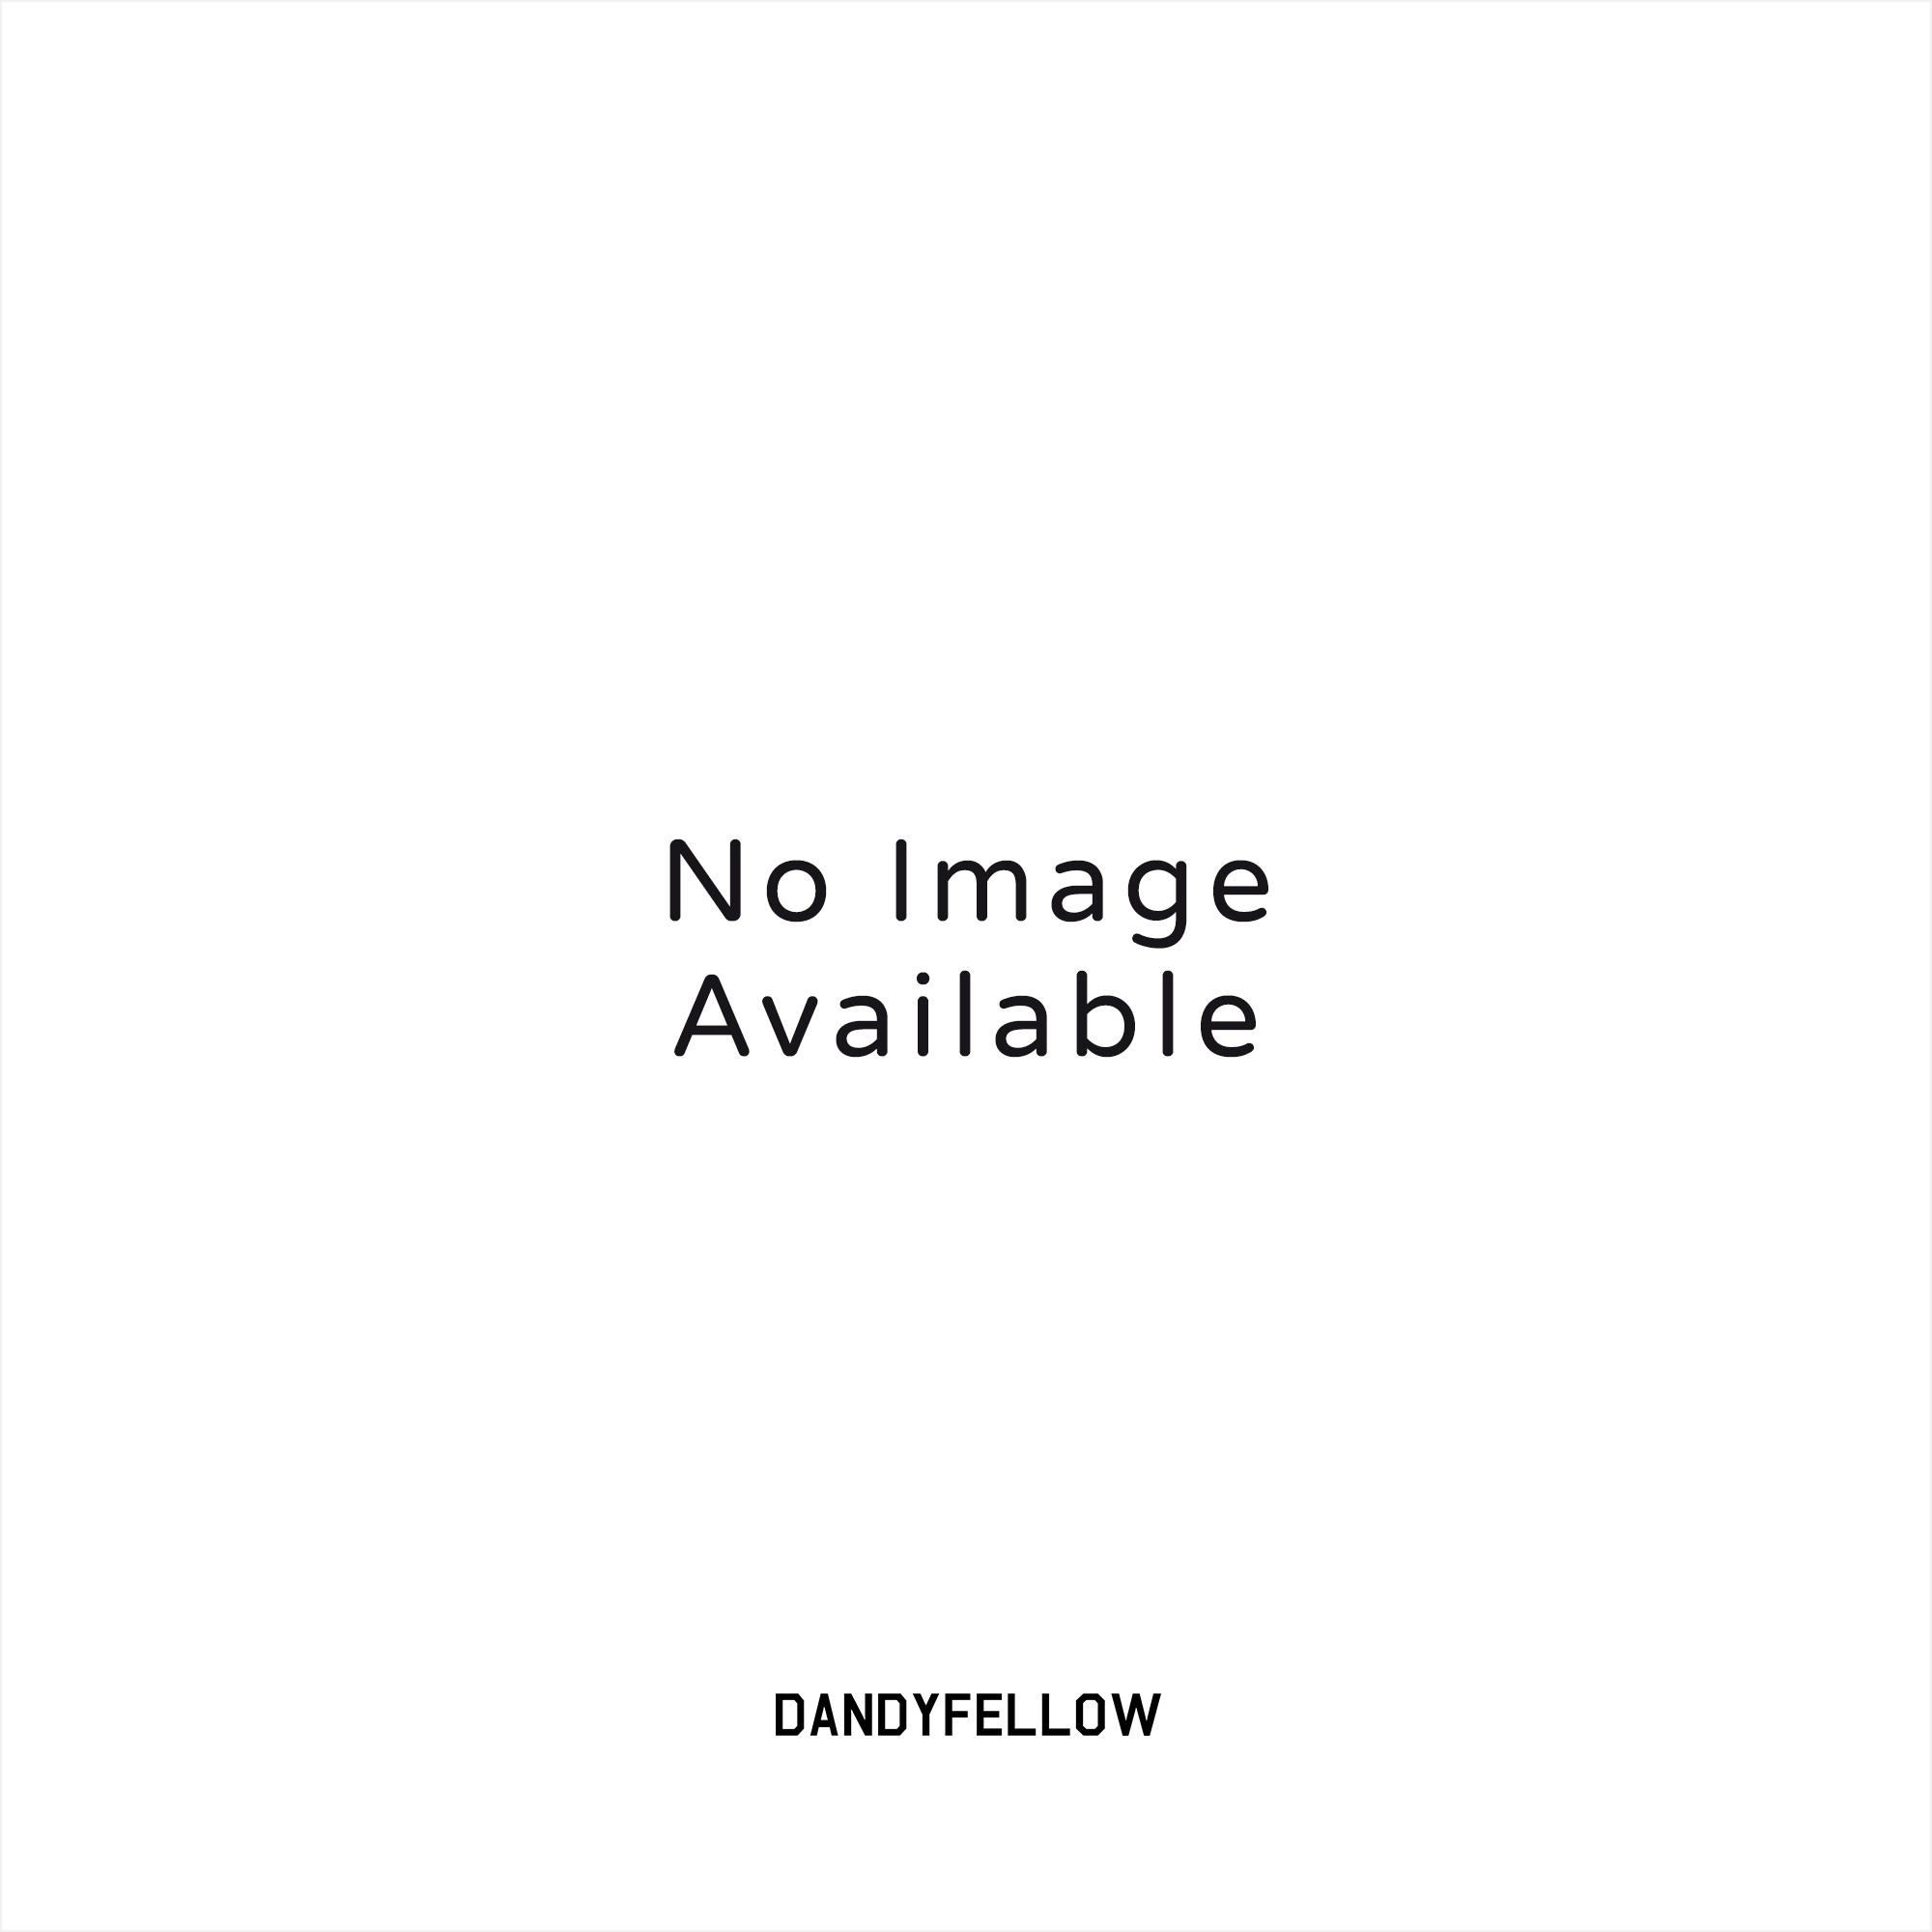 fb727a4505 Orlebar Brown Setter Piping Swim Shorts (Bahama Blue & White) at ...